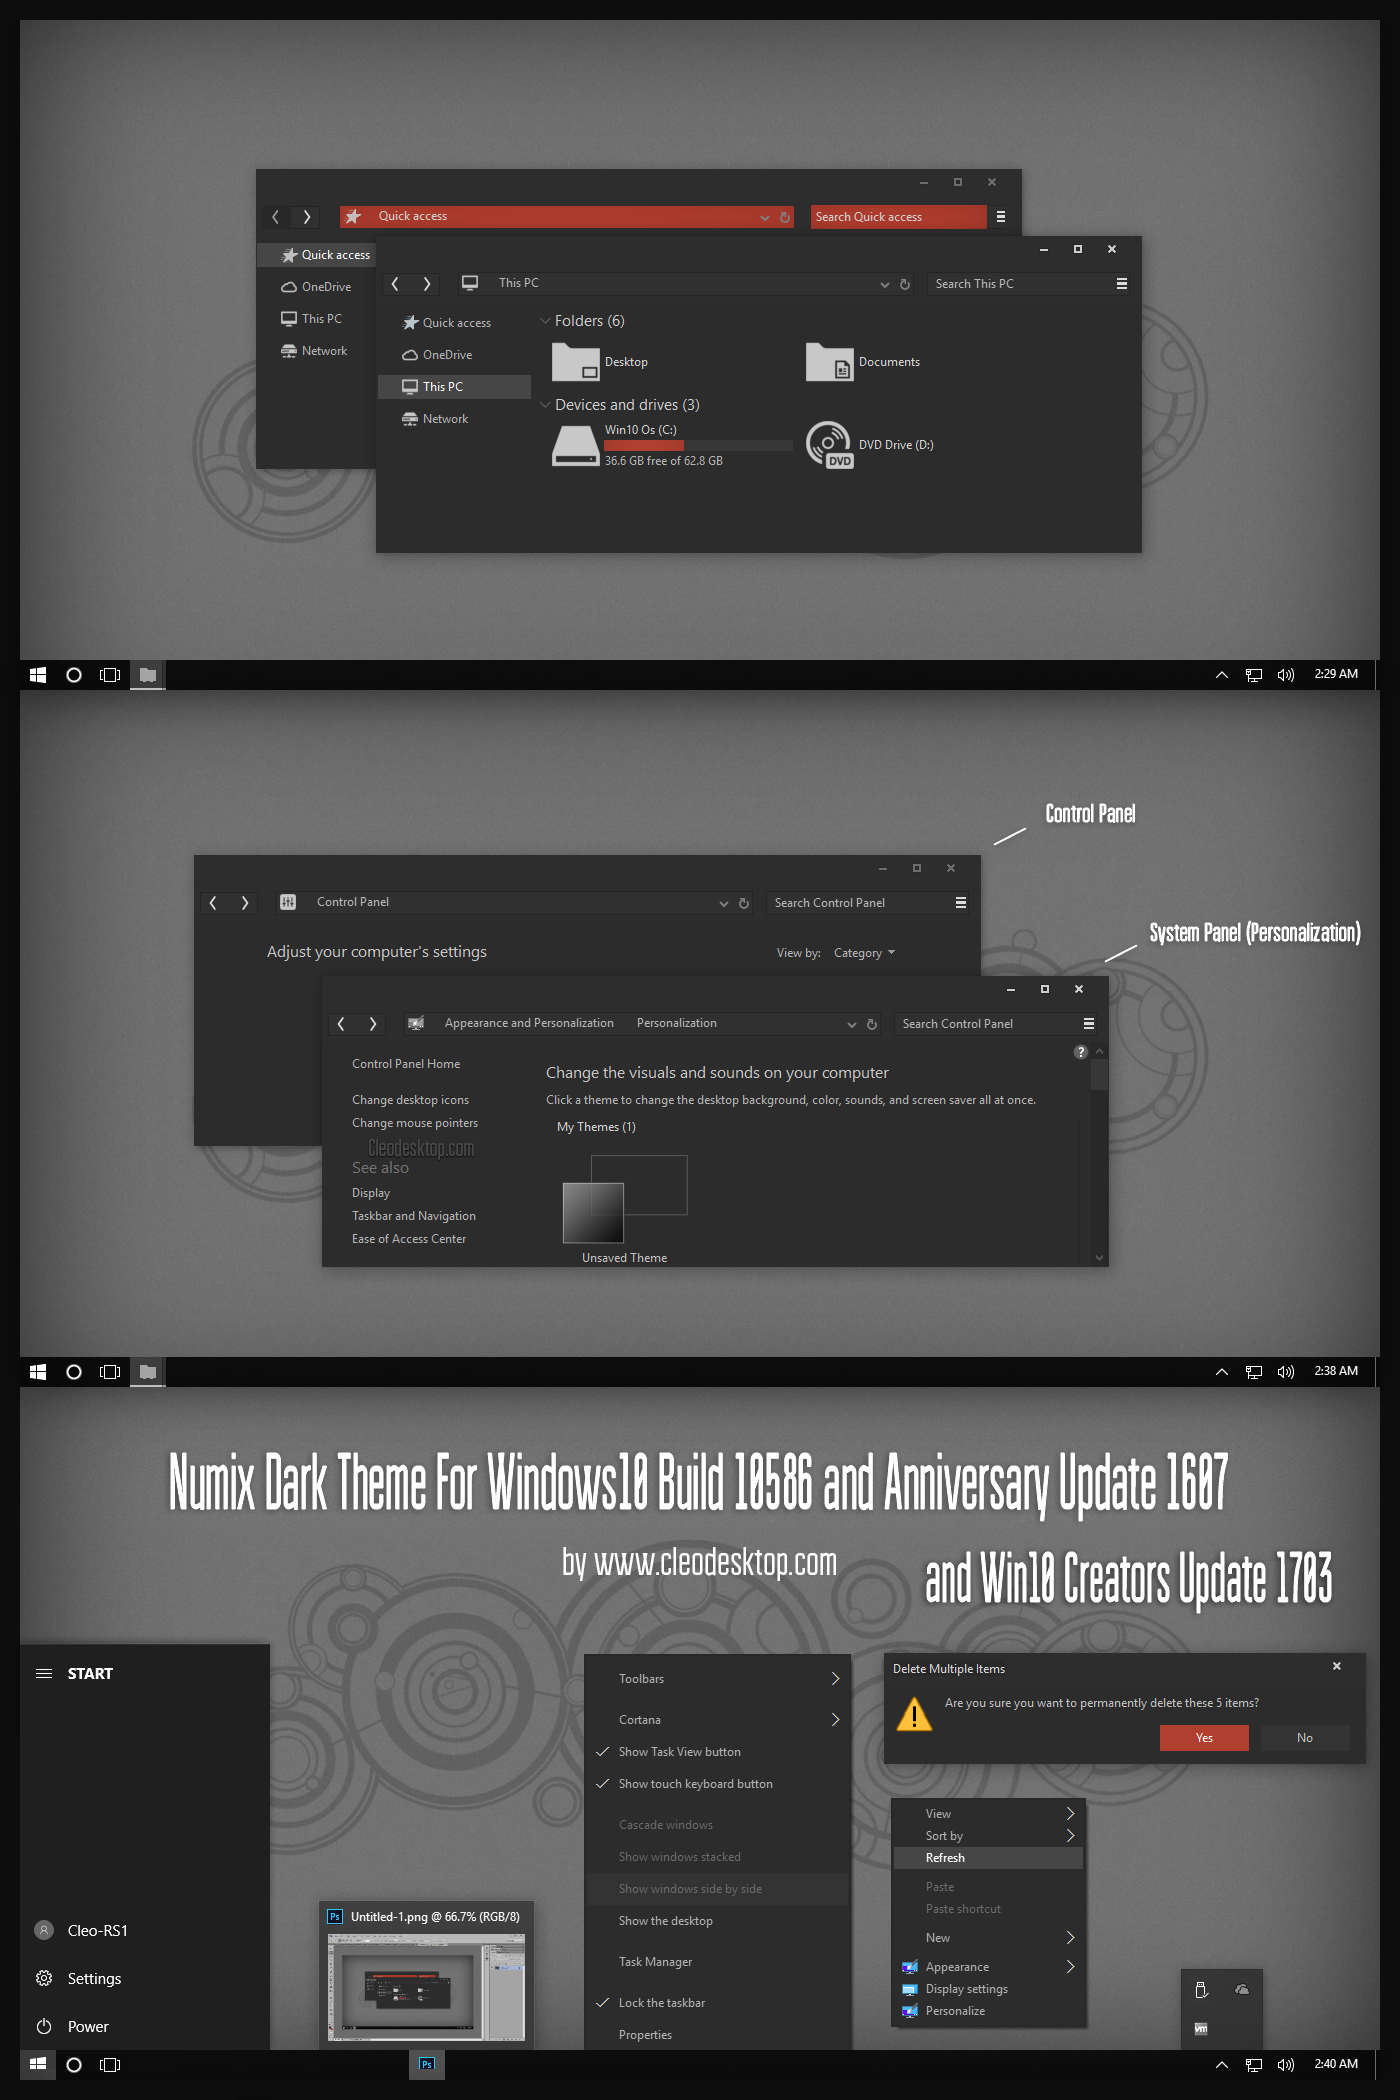 Numix Dark Theme Win10 Creators Update